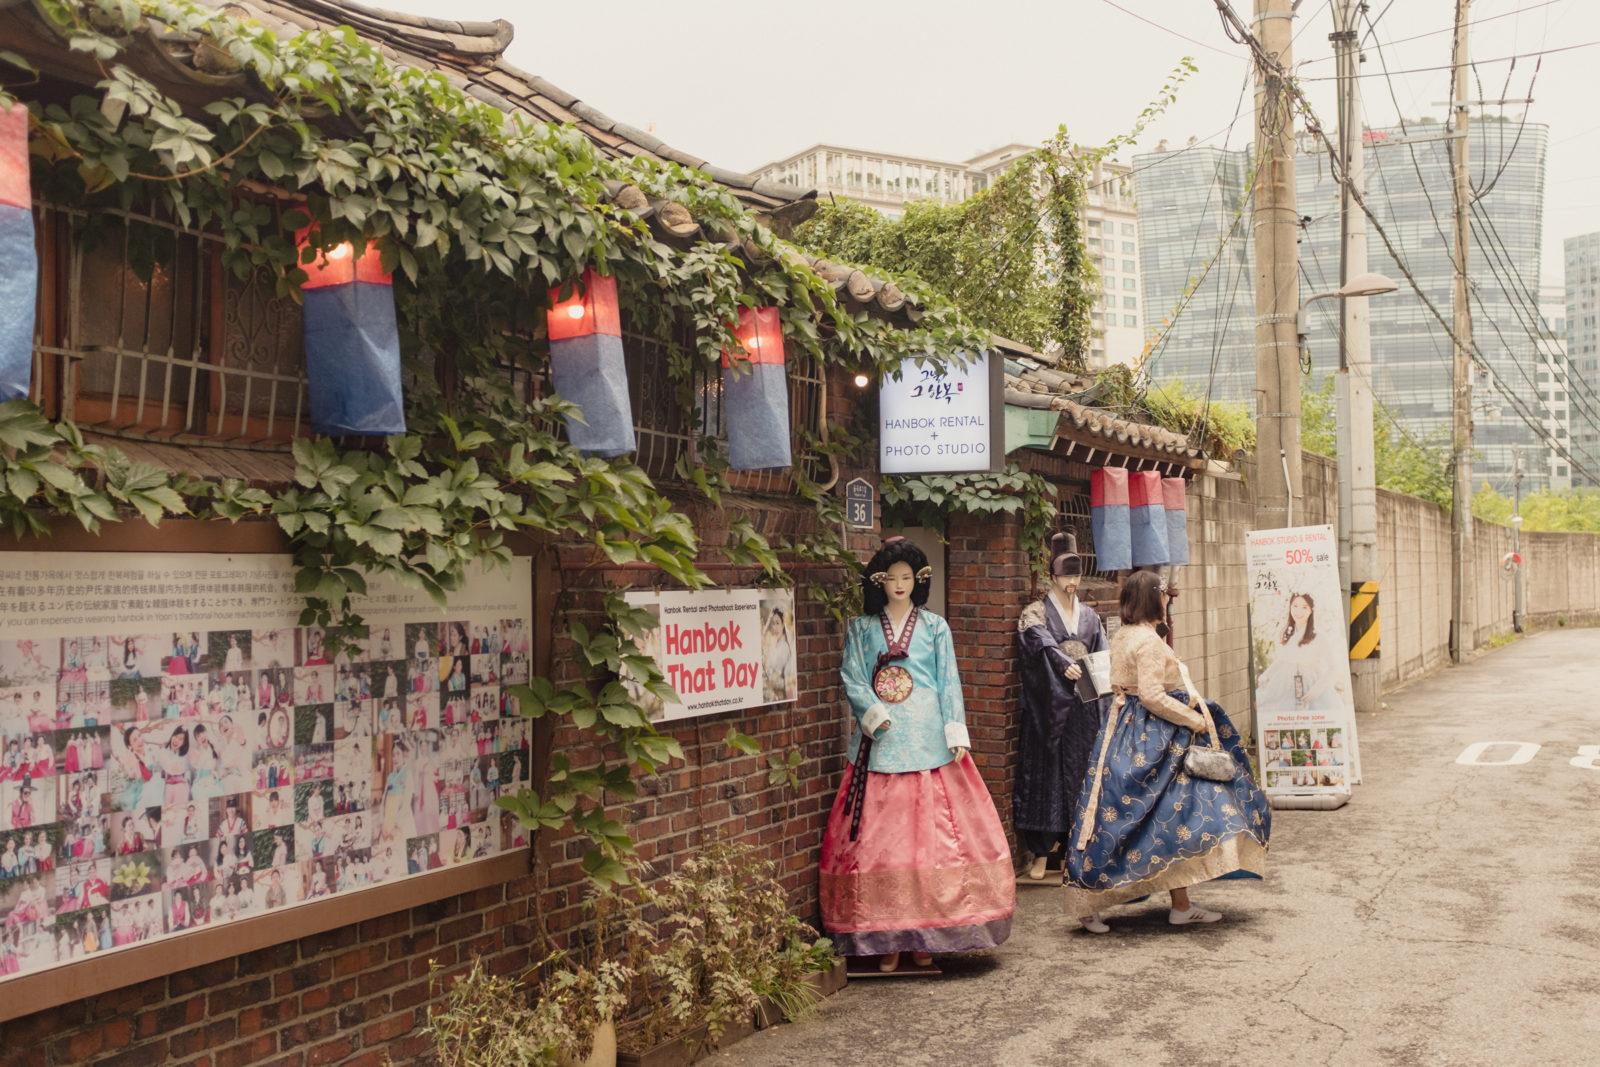 Hanbok That Day Rental and Photo Studio